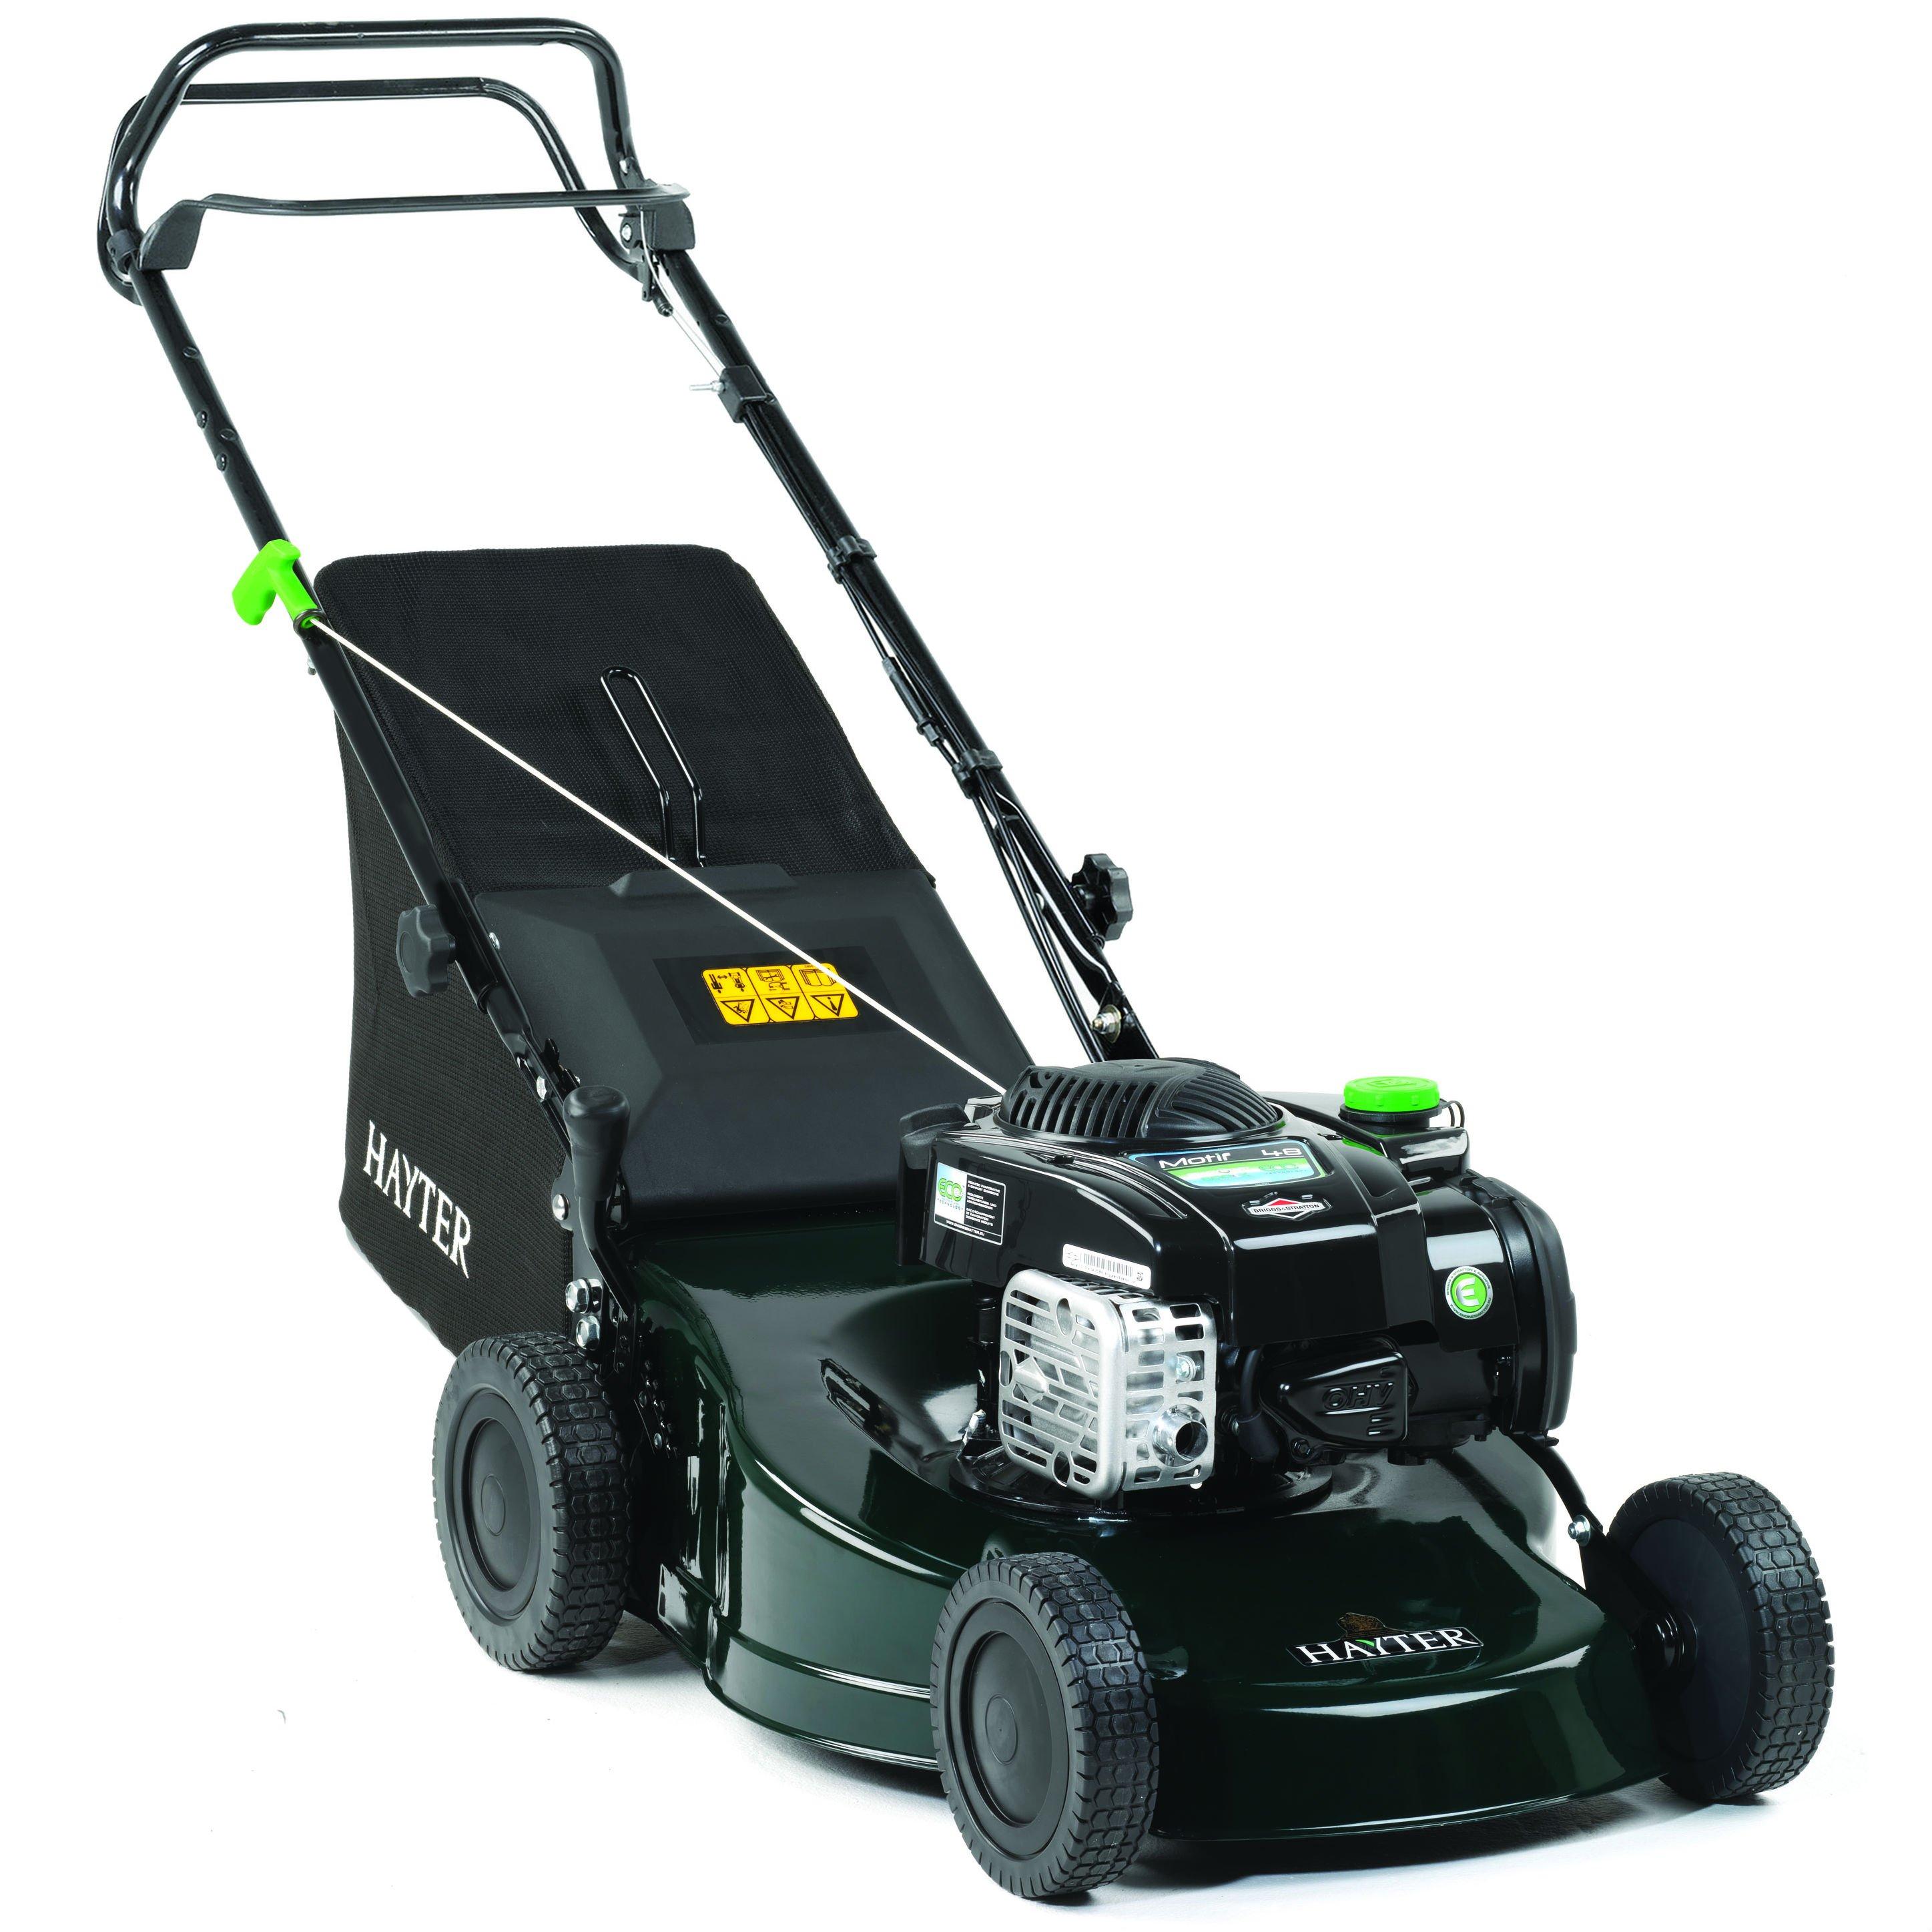 Hayter Motif 48 Autodrive Lawn Mower (Code 439)